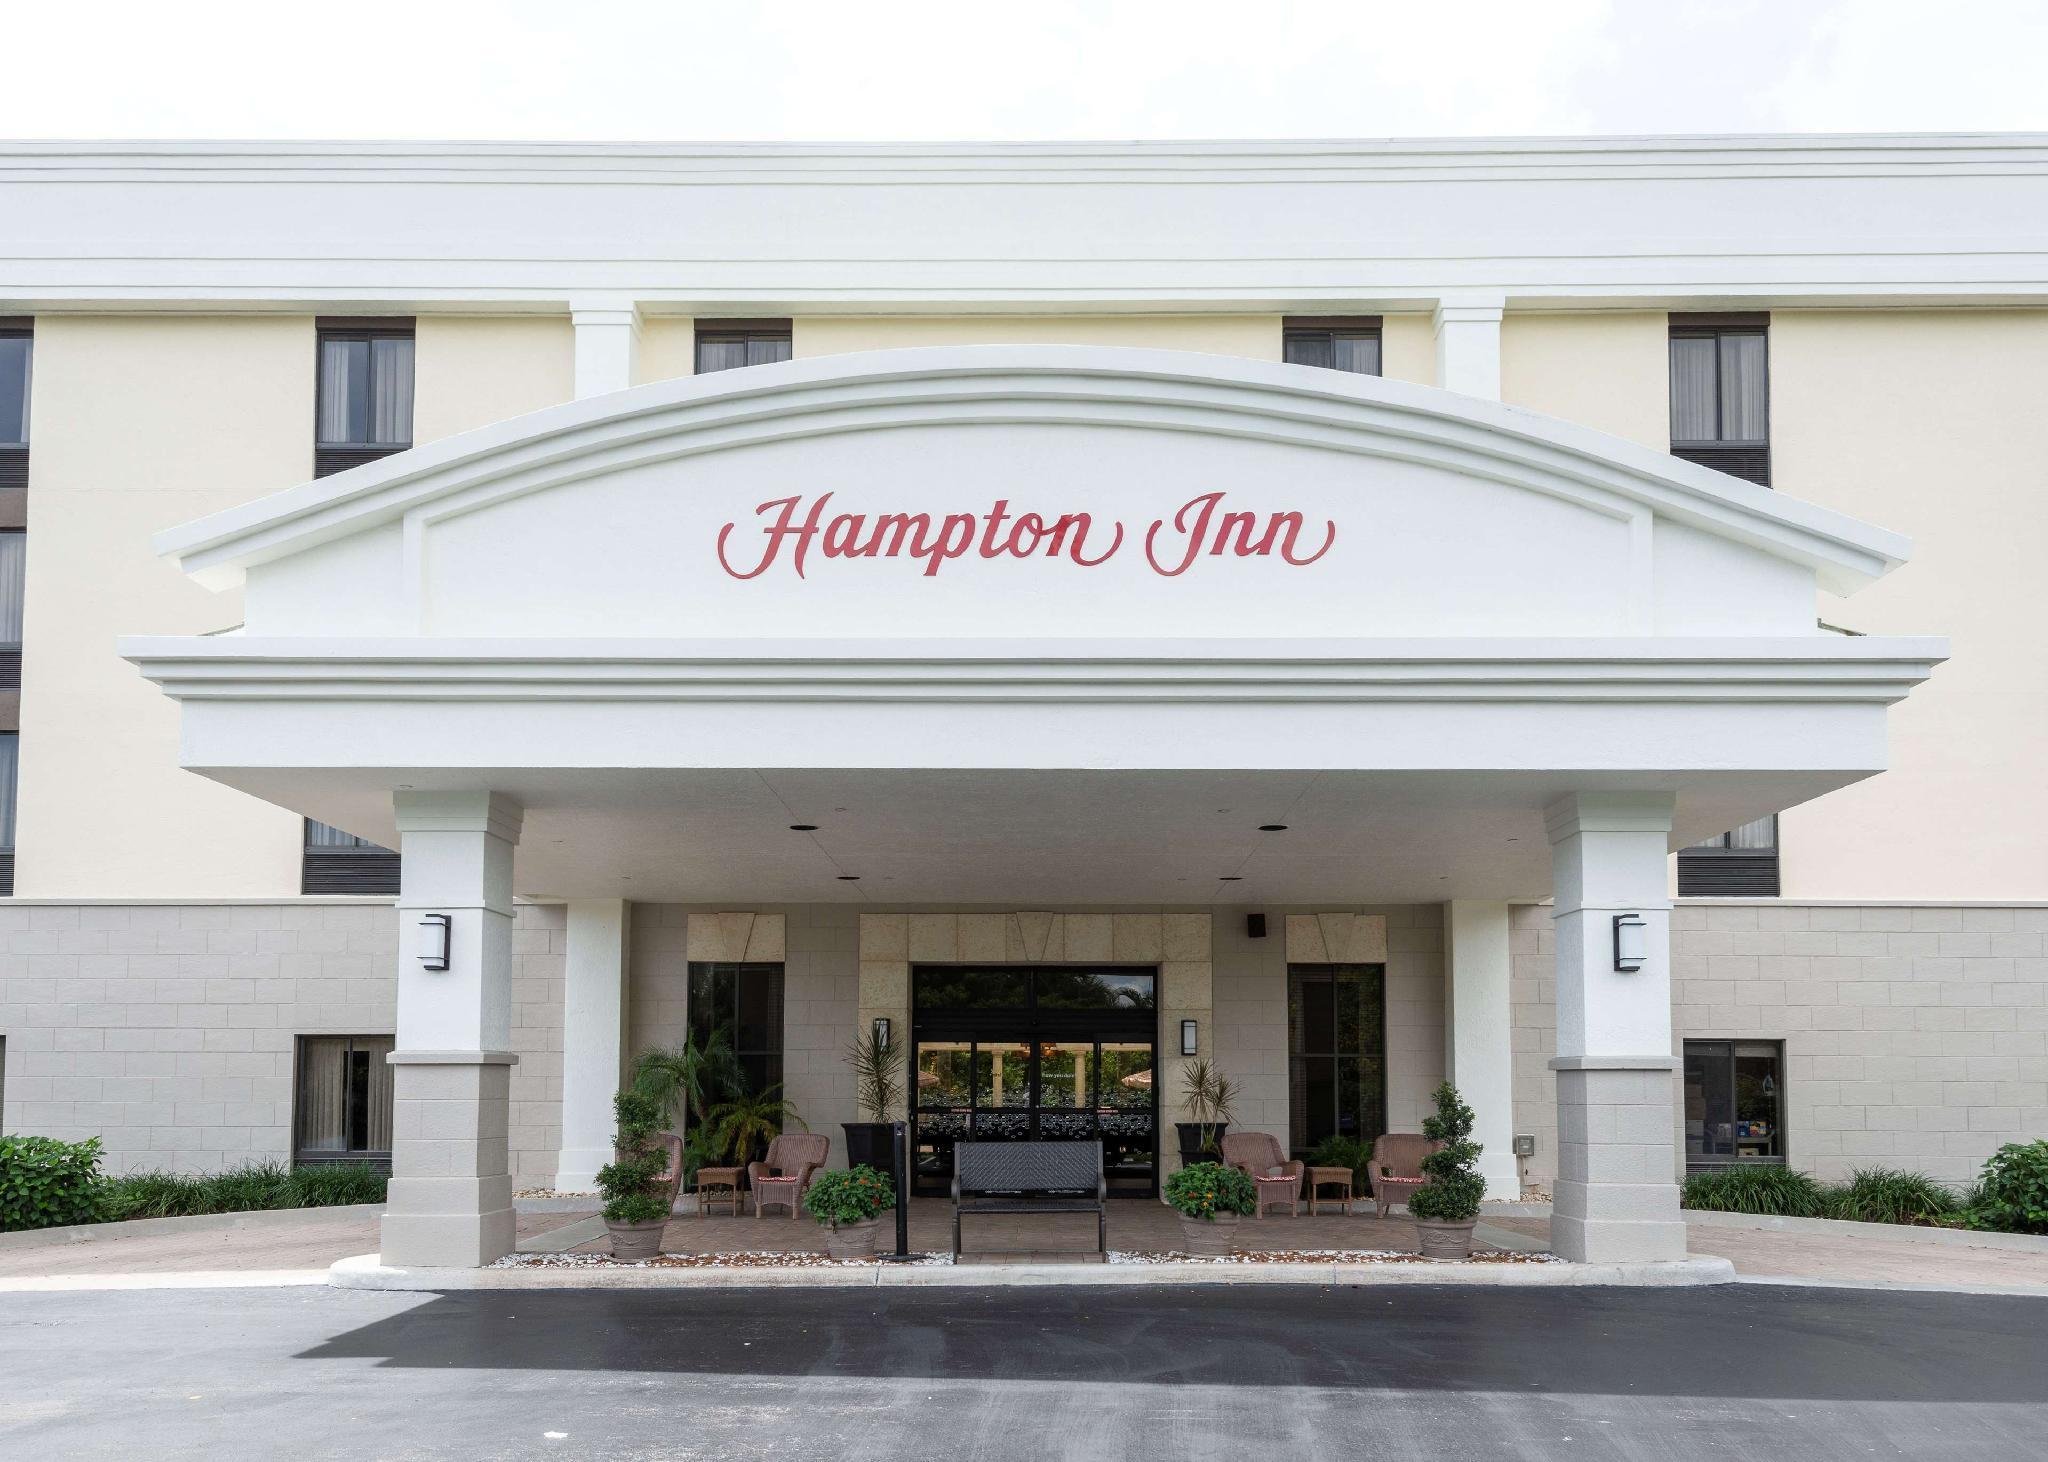 Hampton Inn Boca Raton Hotel